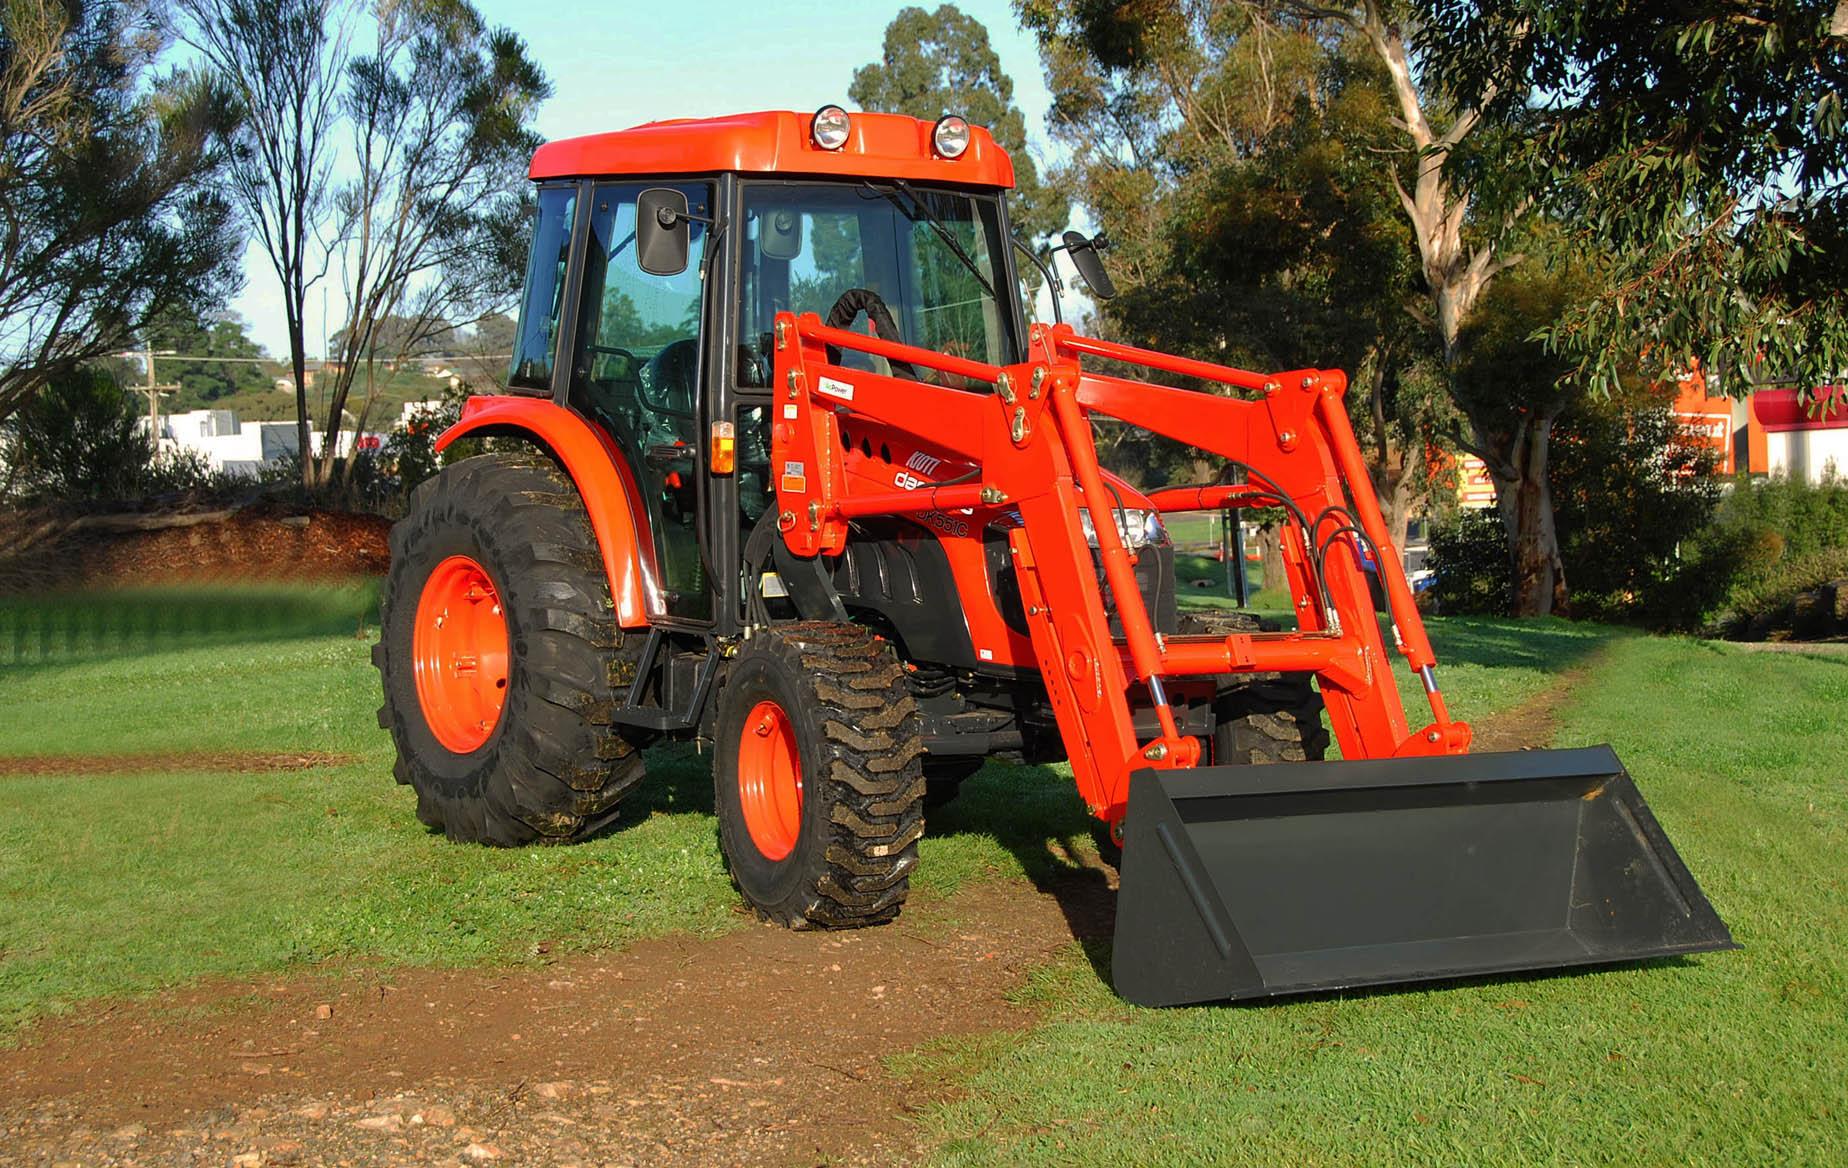 File:Daedong-Kioti Tractor DK551 jpg - Wikimedia Commons